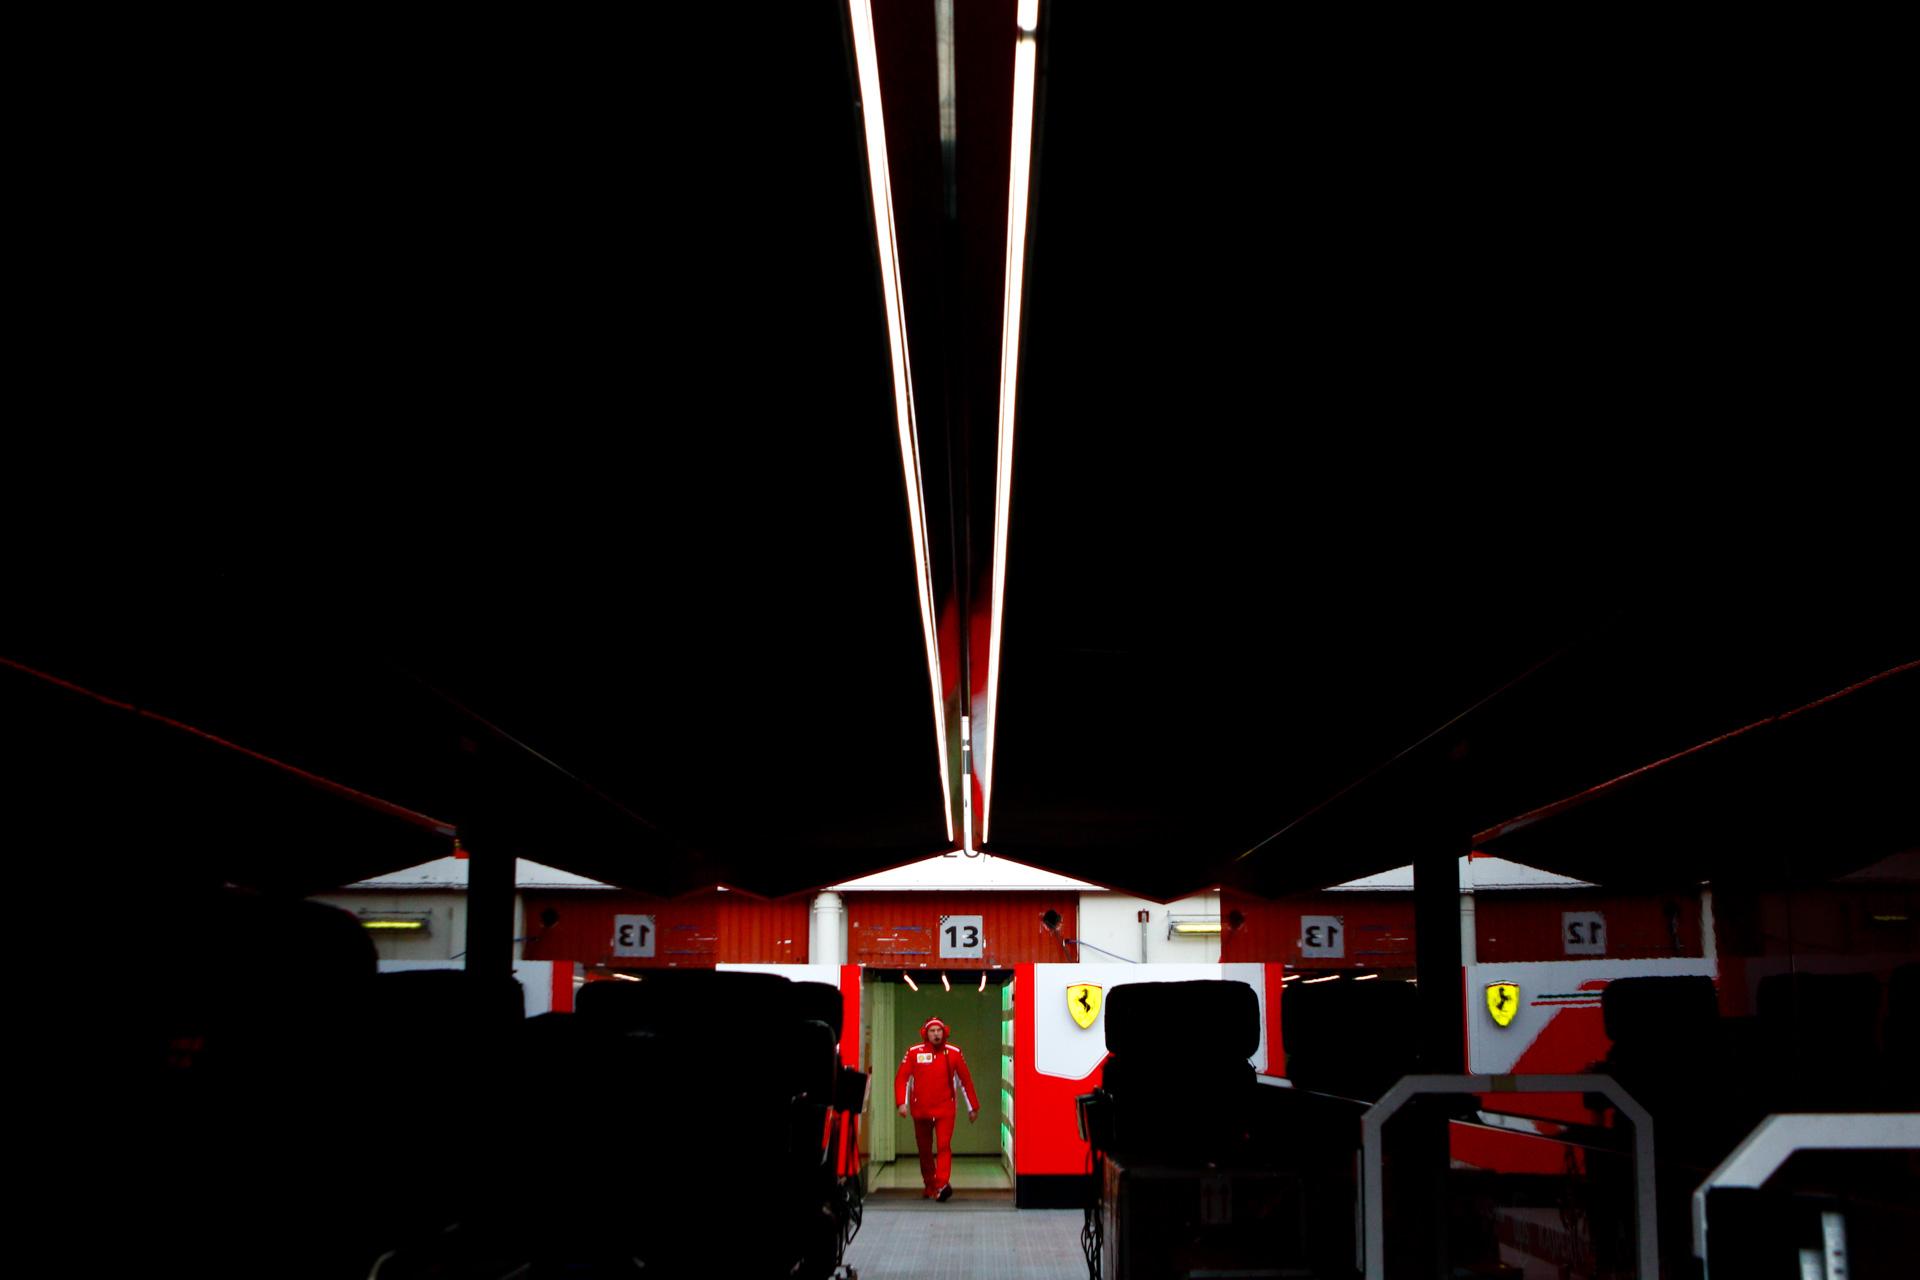 - F1 Test Days - Circuit de Barcelona Catalunya - Spain - 08 March 2018